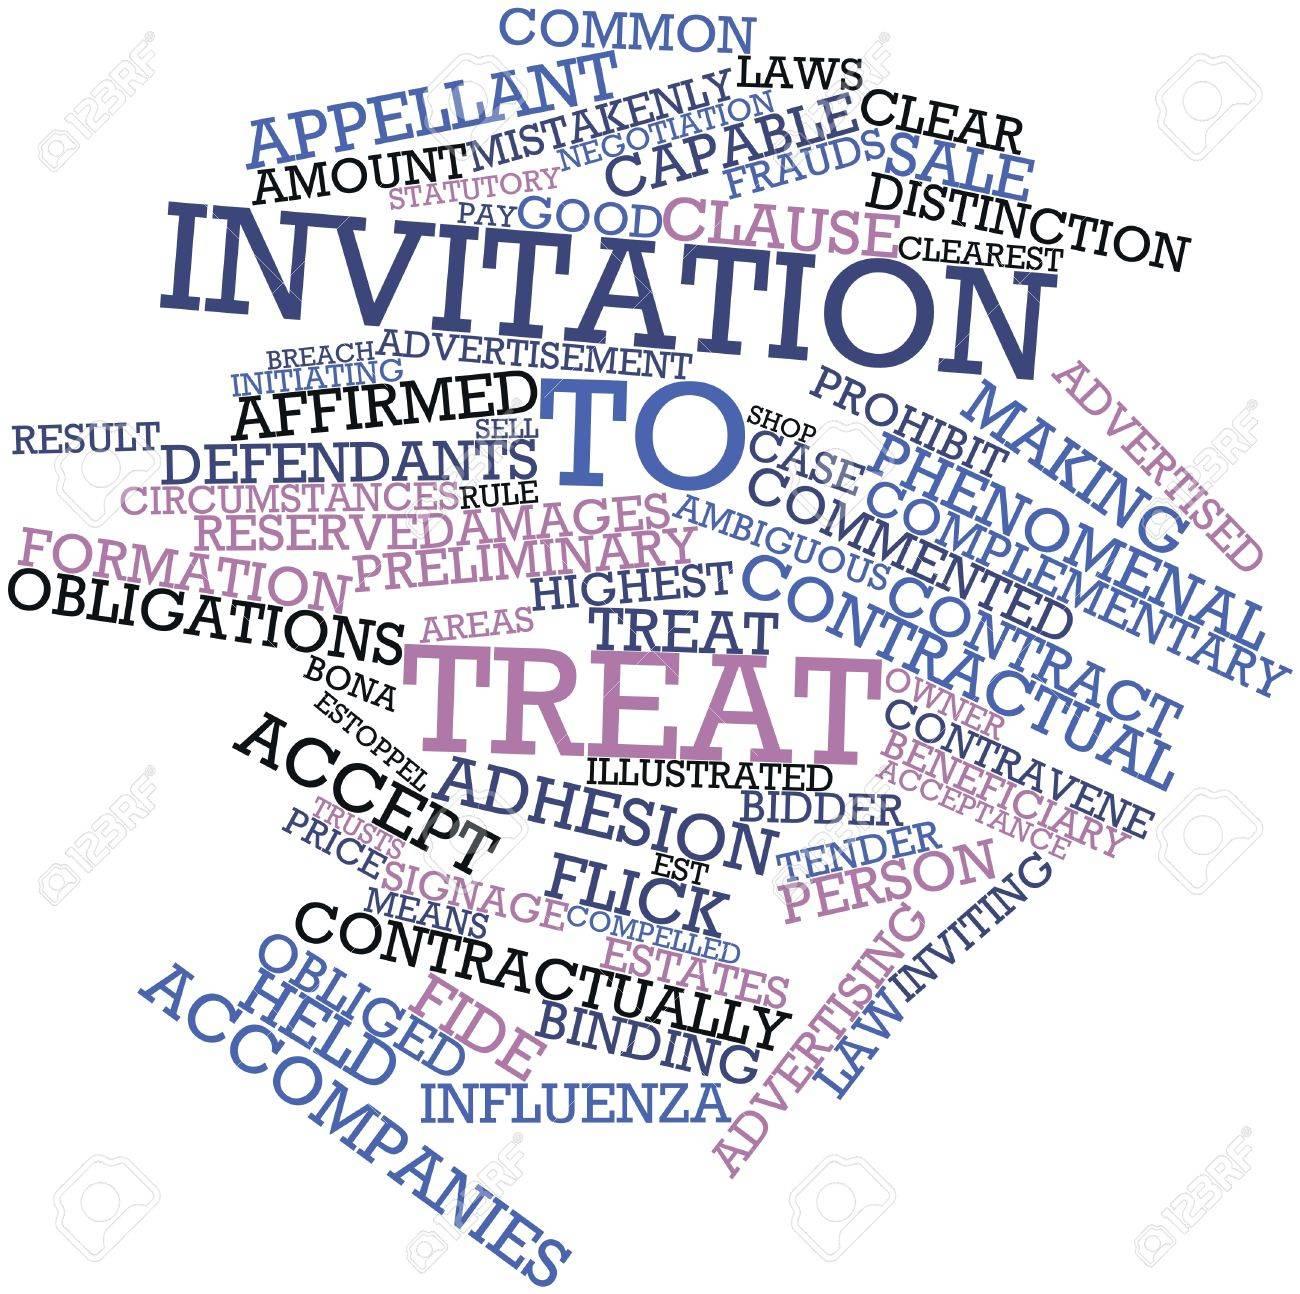 Invitation to treat definition malaysia gallery invitation sample definition of invitation to treat in business law gallery invitation to treat definition choice image invitation stopboris Choice Image